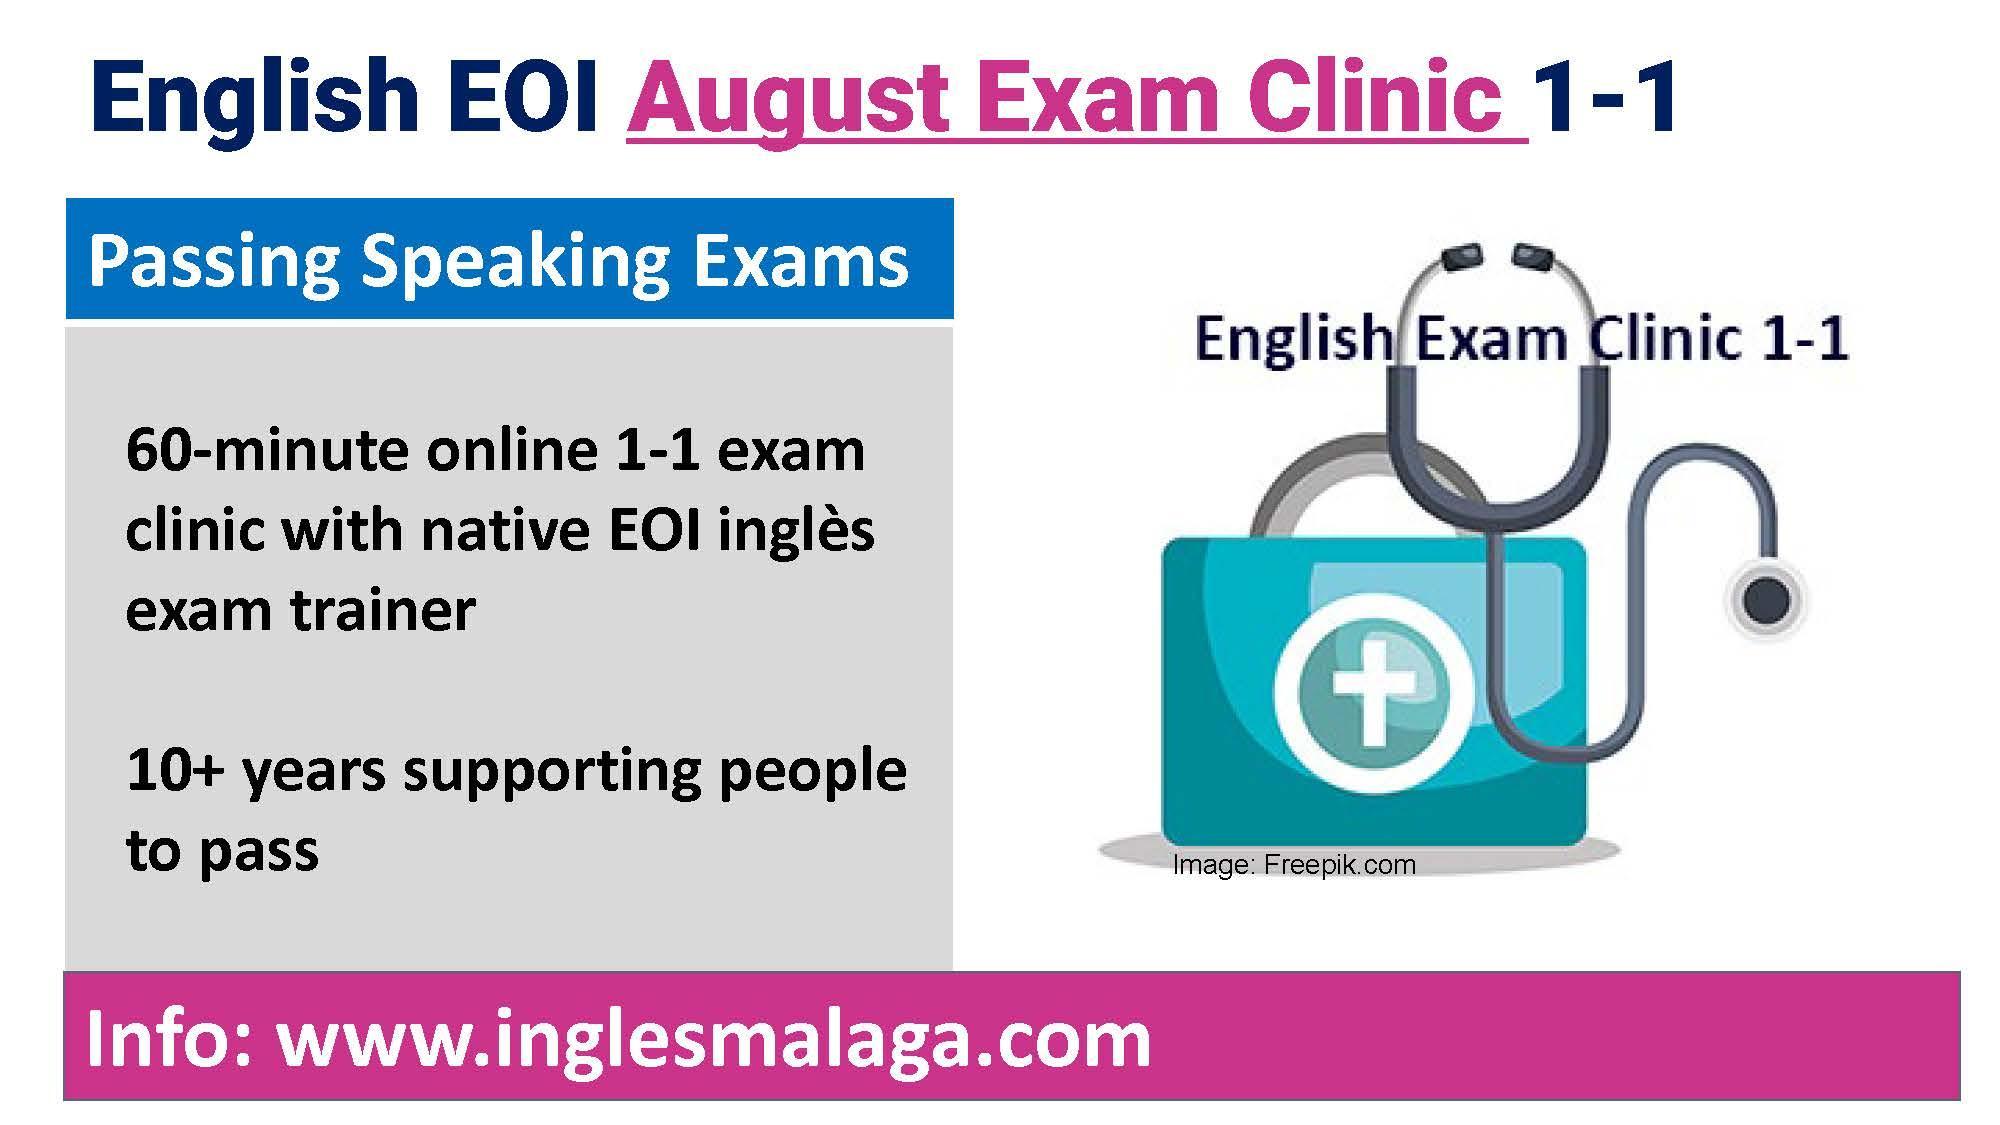 Agosto exam clinic